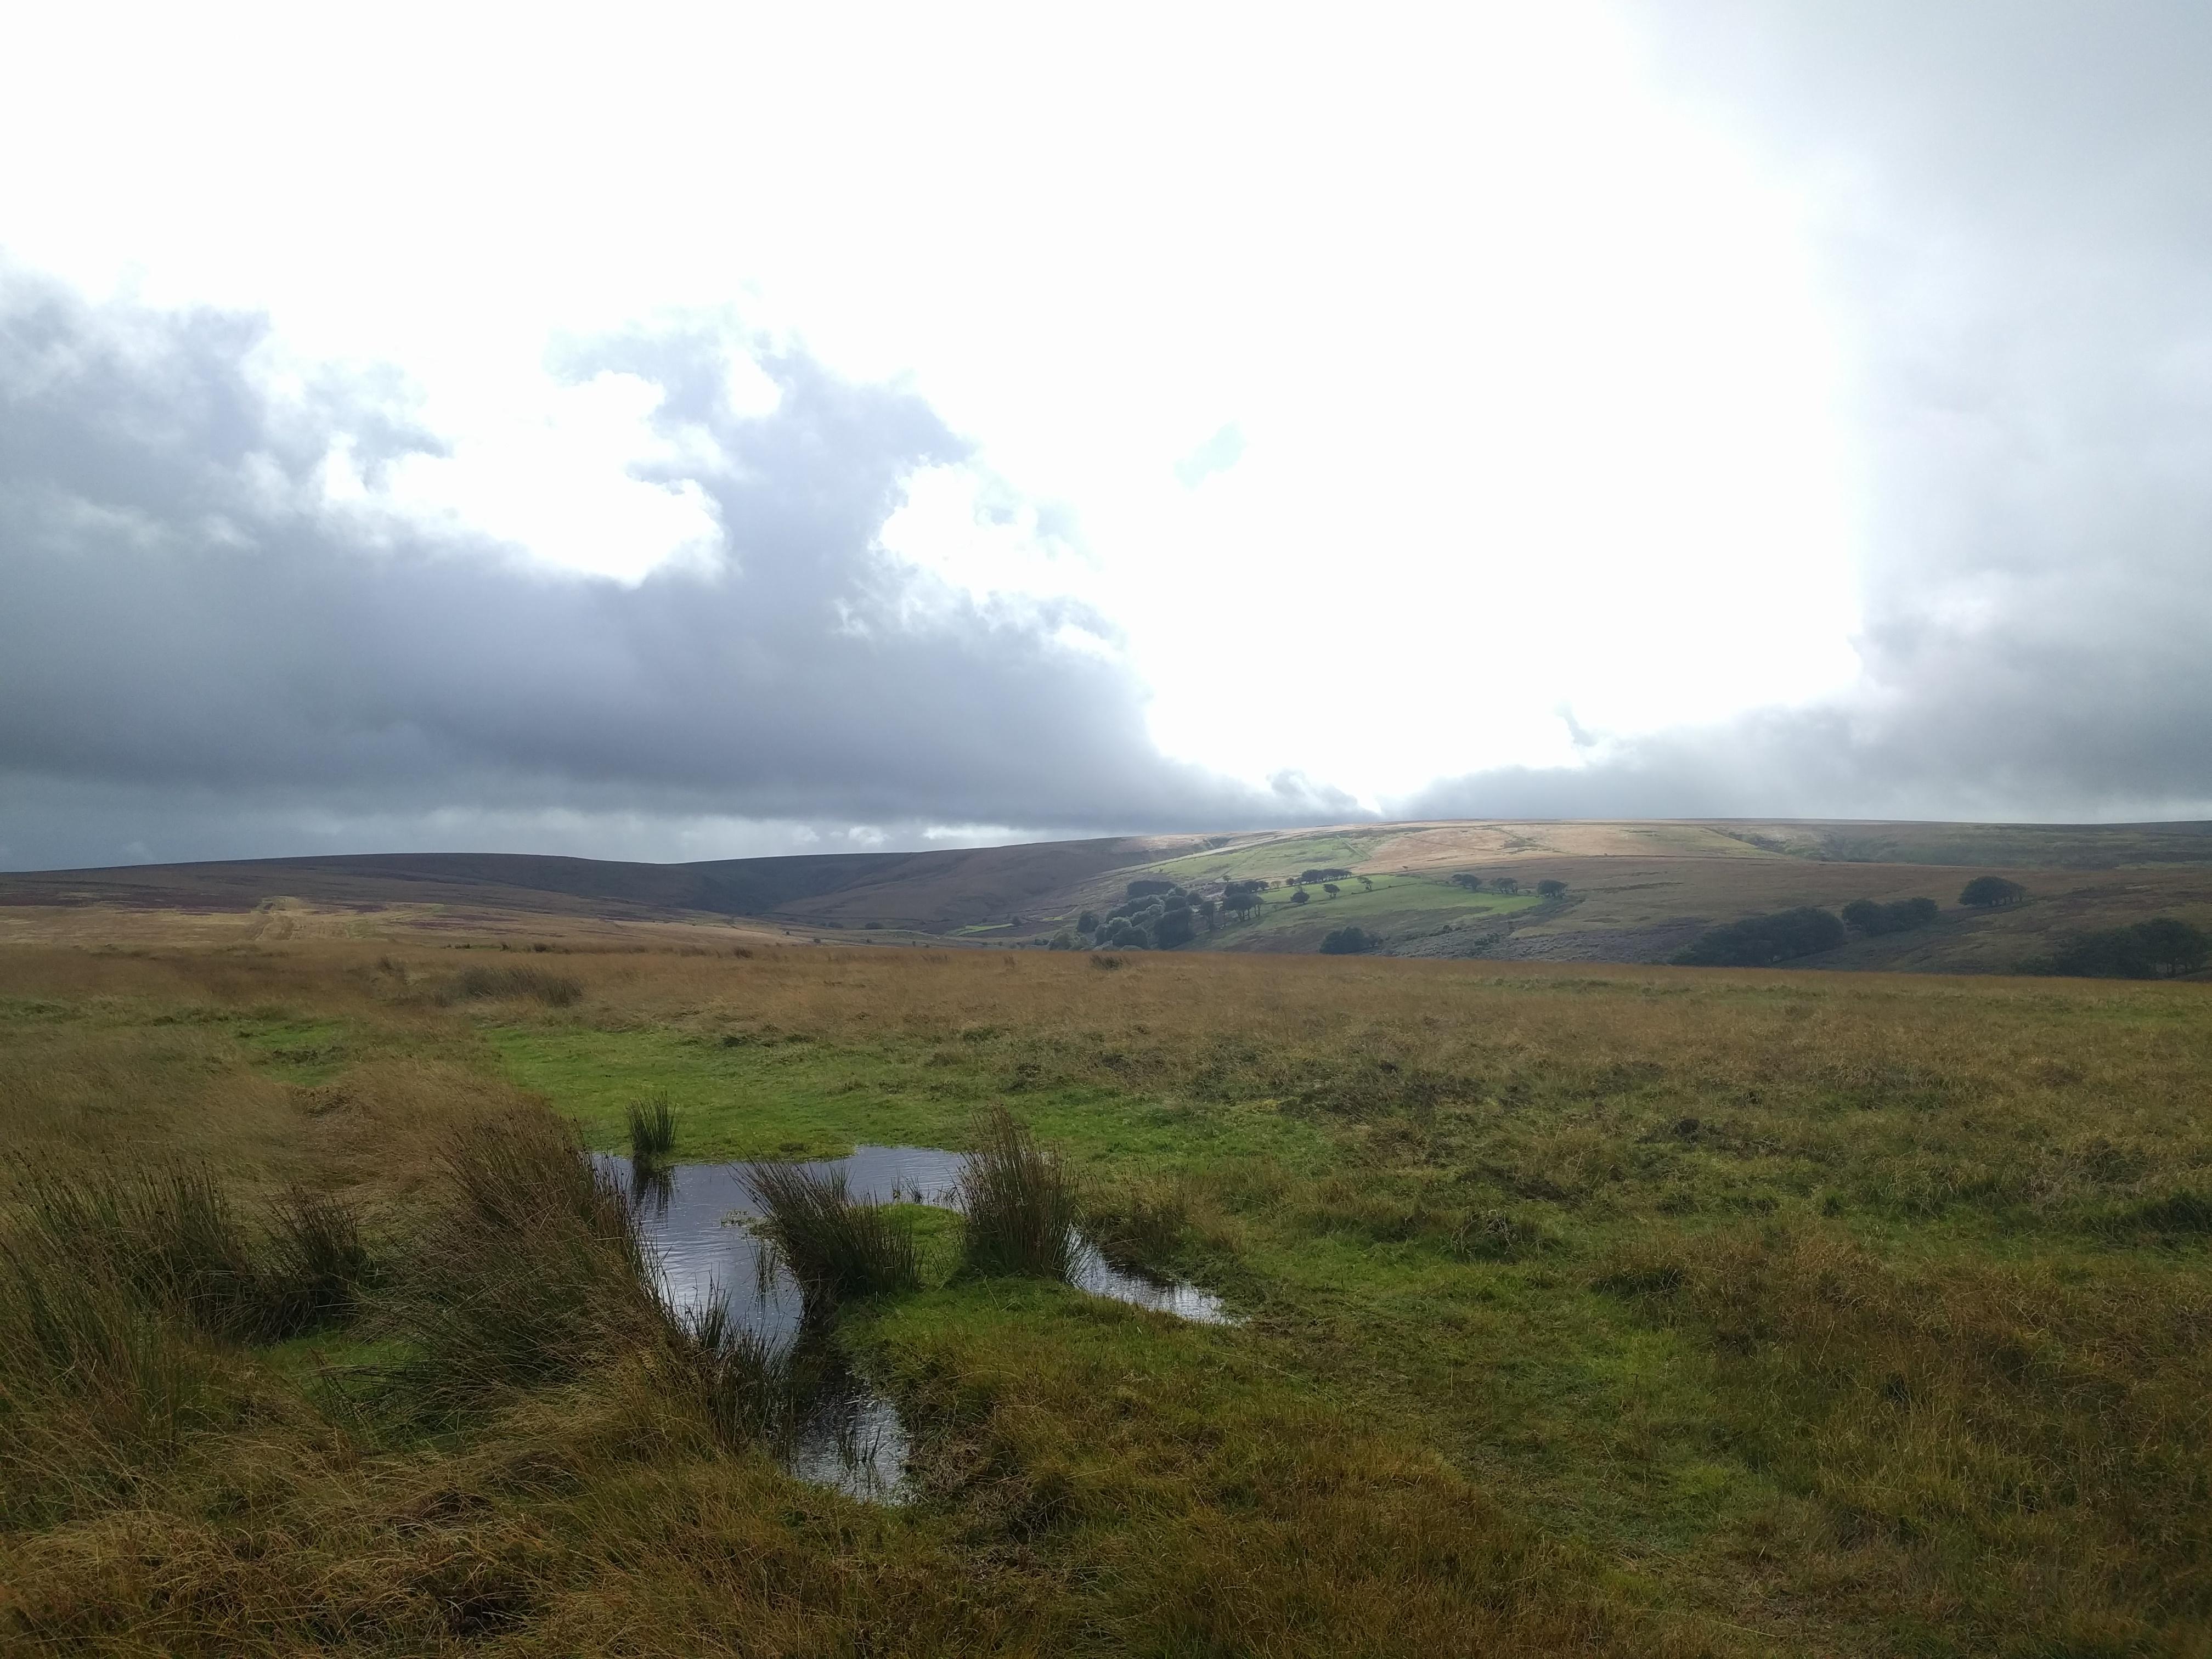 On Cheriton Ridge #sh #twomoorsway #DevonC2C